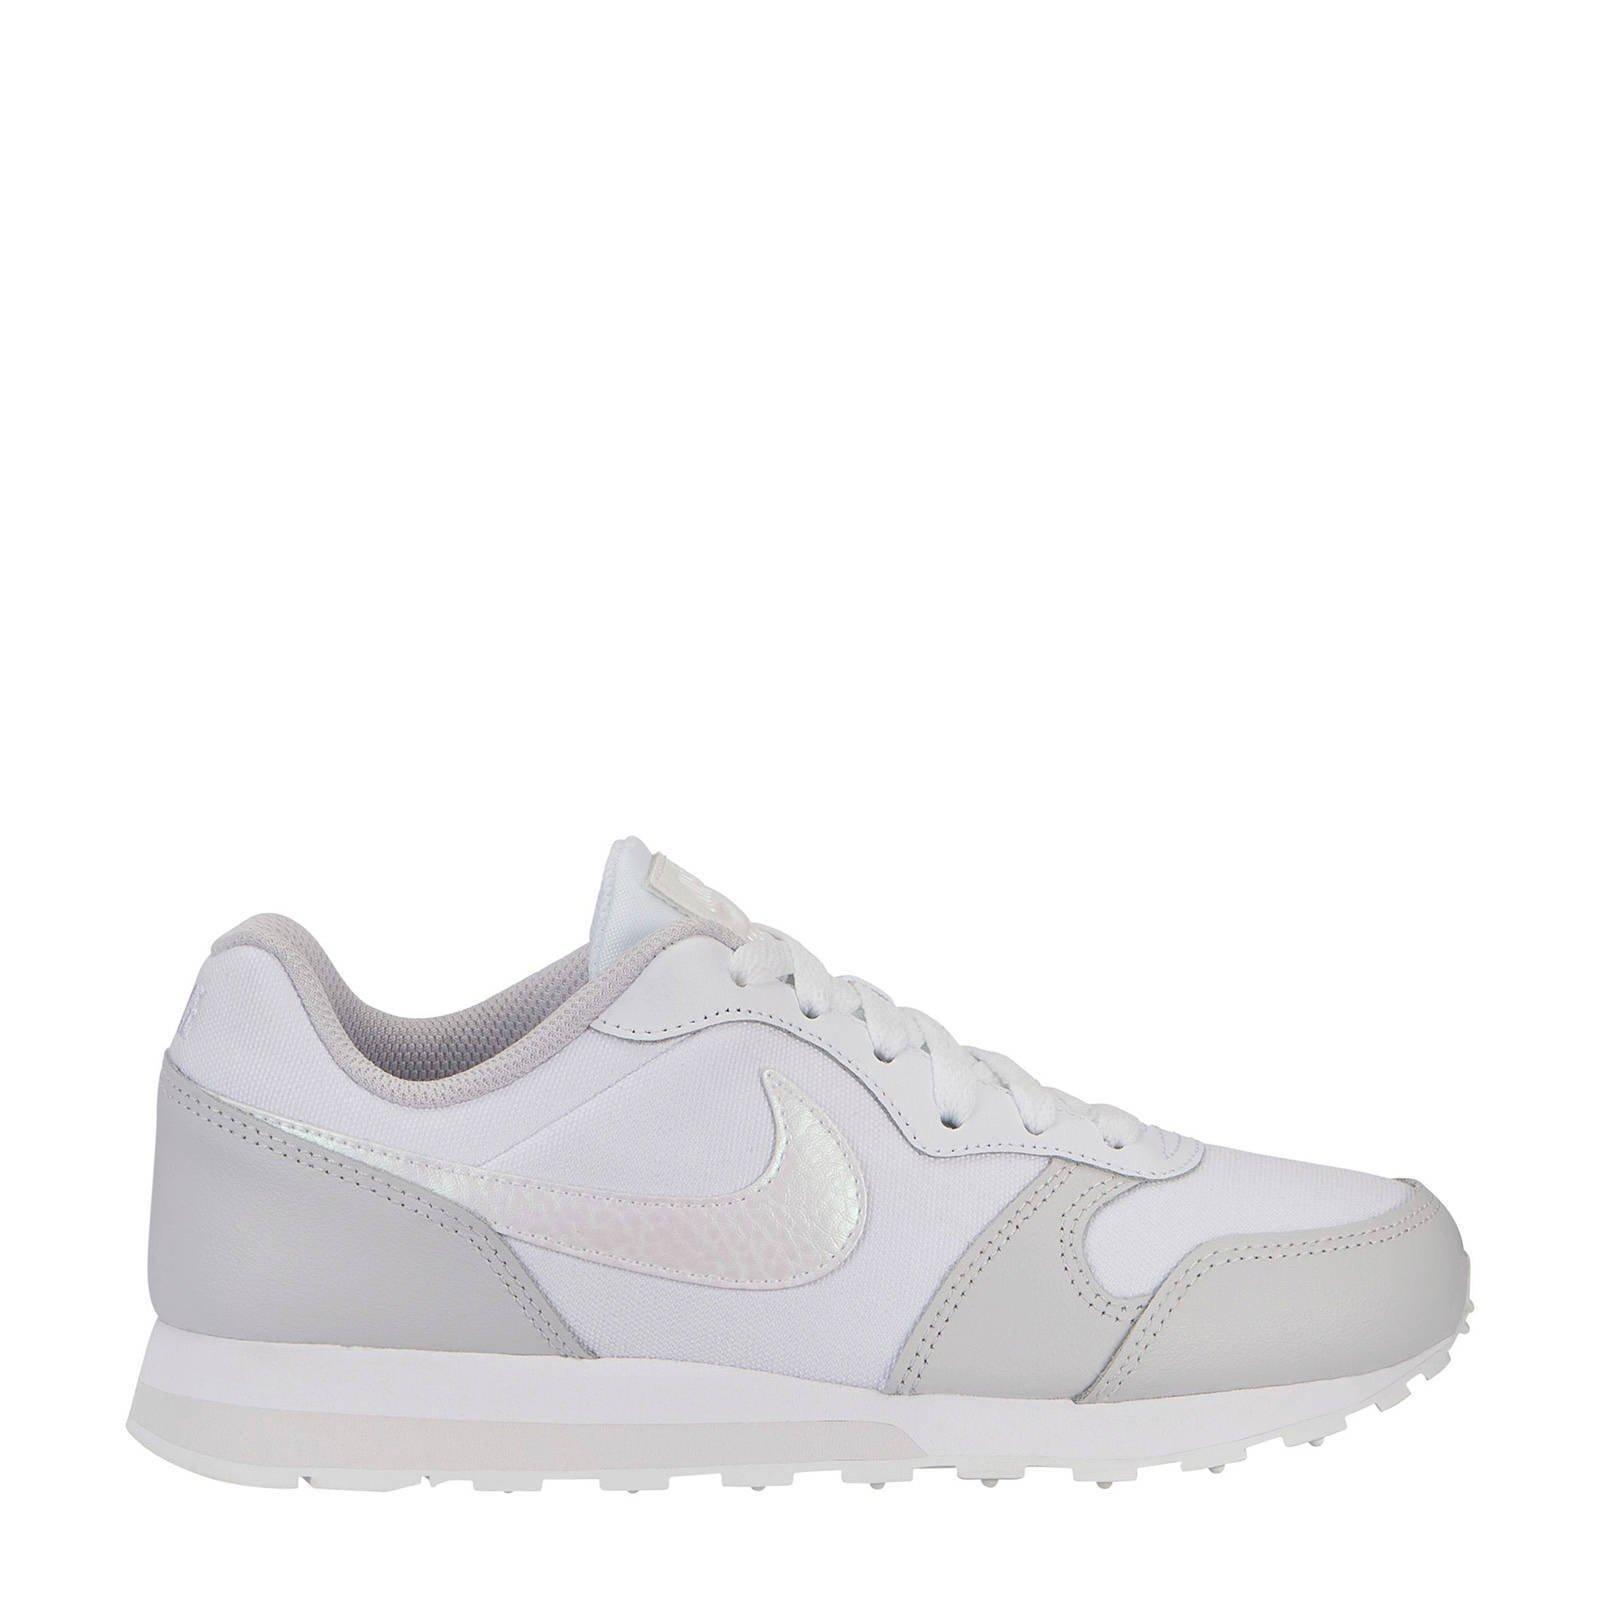 MD Runner 2 sneakers wit/lichtgrijs